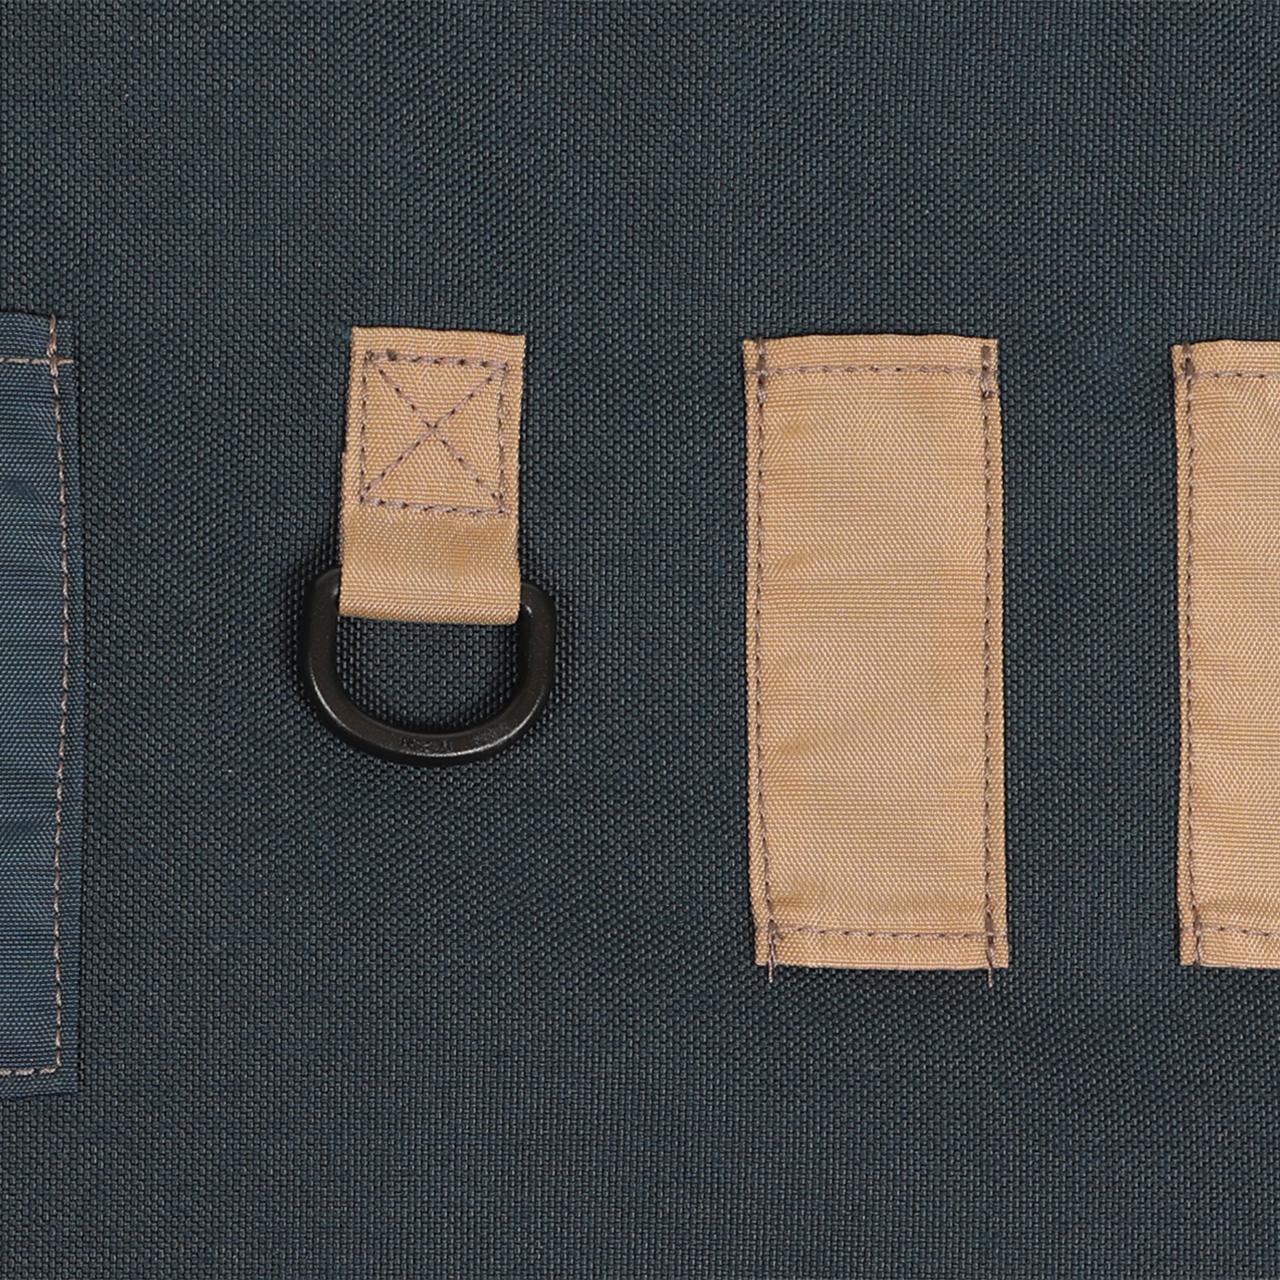 drifter_wall pocket